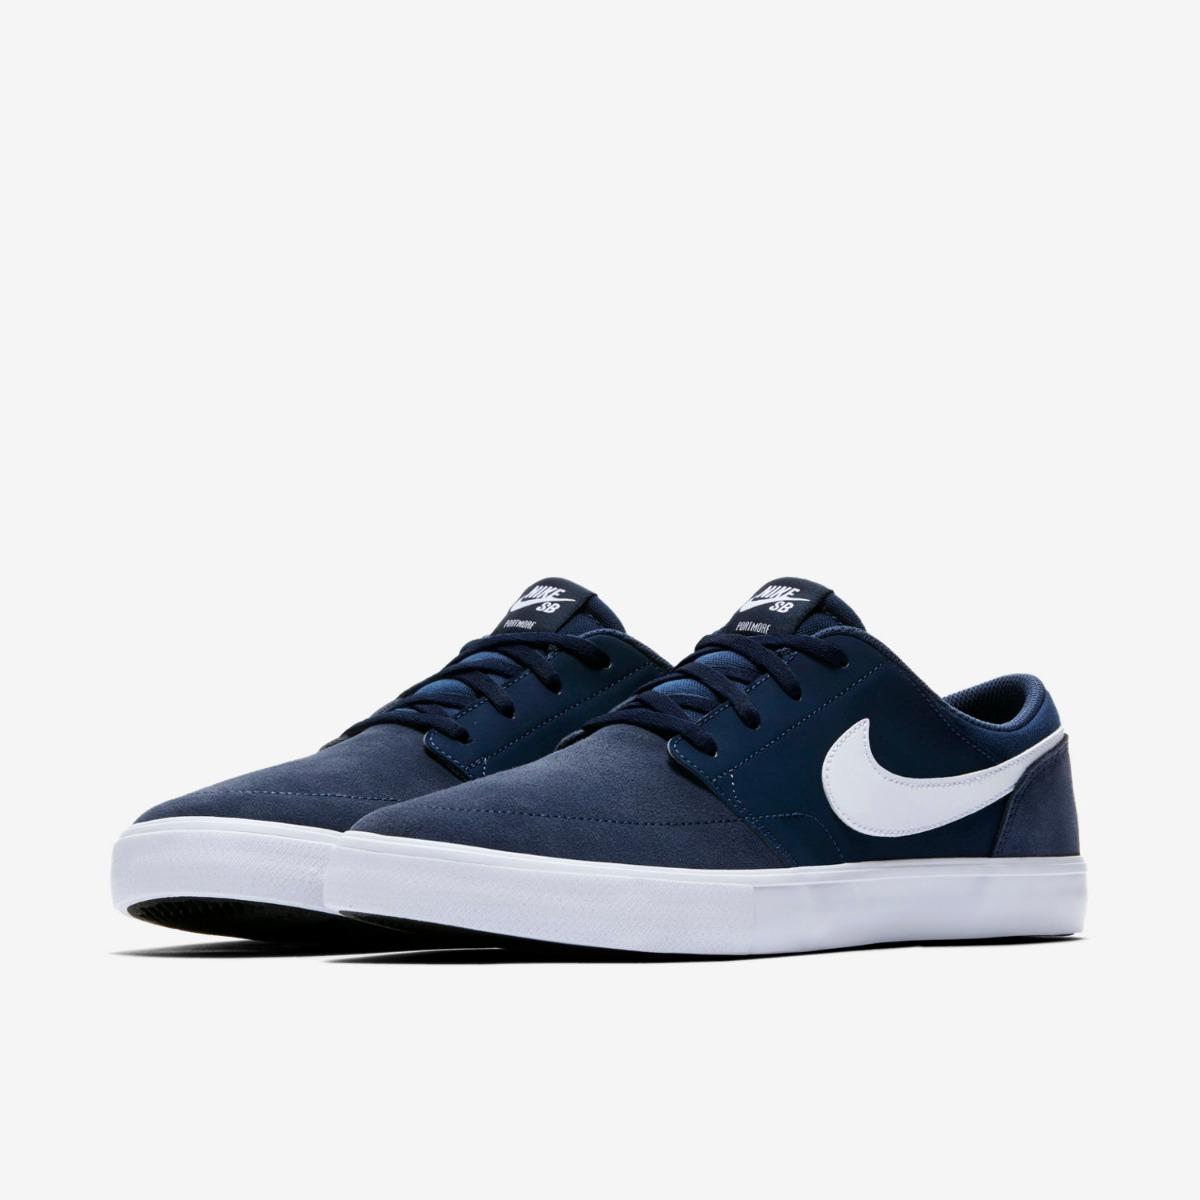 low priced 30519 02fae zapatillas nike sb portmore azul oscuro navy hombre mujer. Cargando zoom.